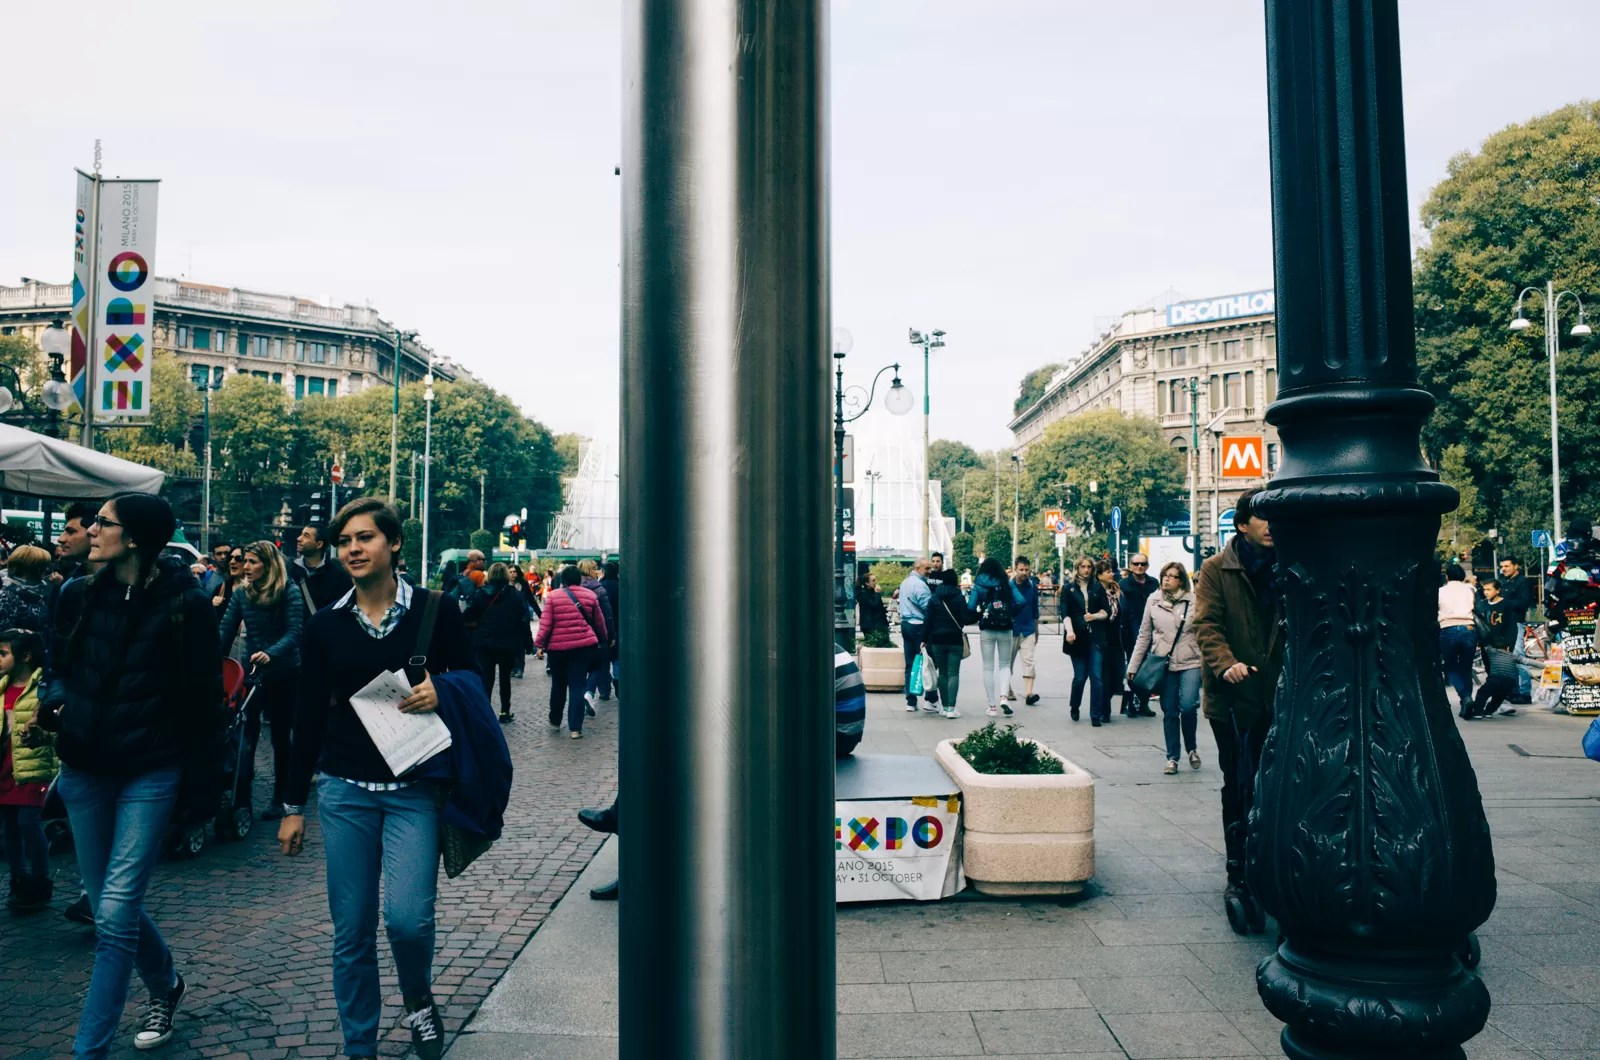 R0010287 - GIUSTAPPORRE IN STREET PHOTOGRAPHY - fotostreet.it